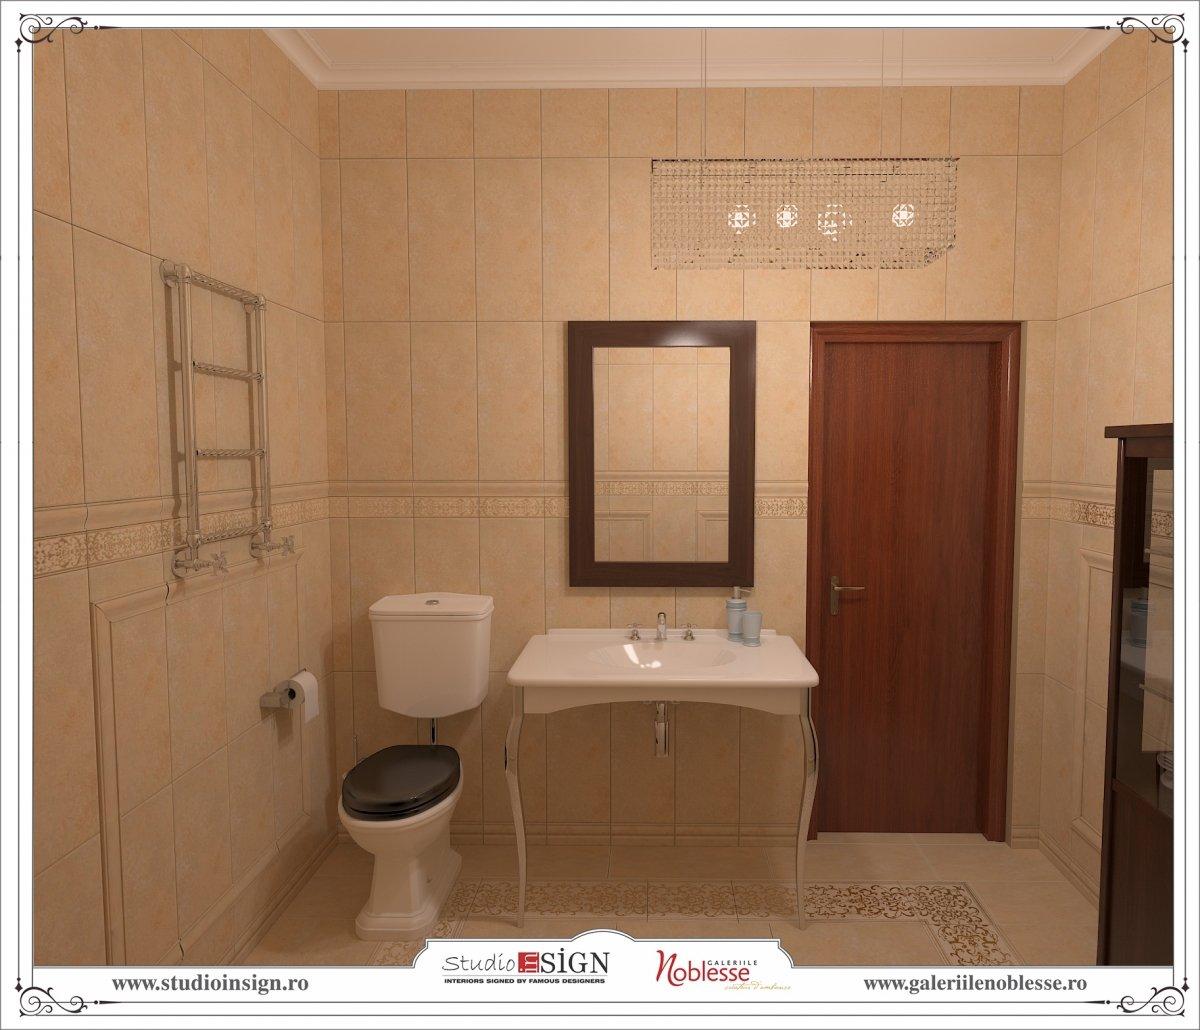 Proiect amenajare interioara - Birouri Macin-19